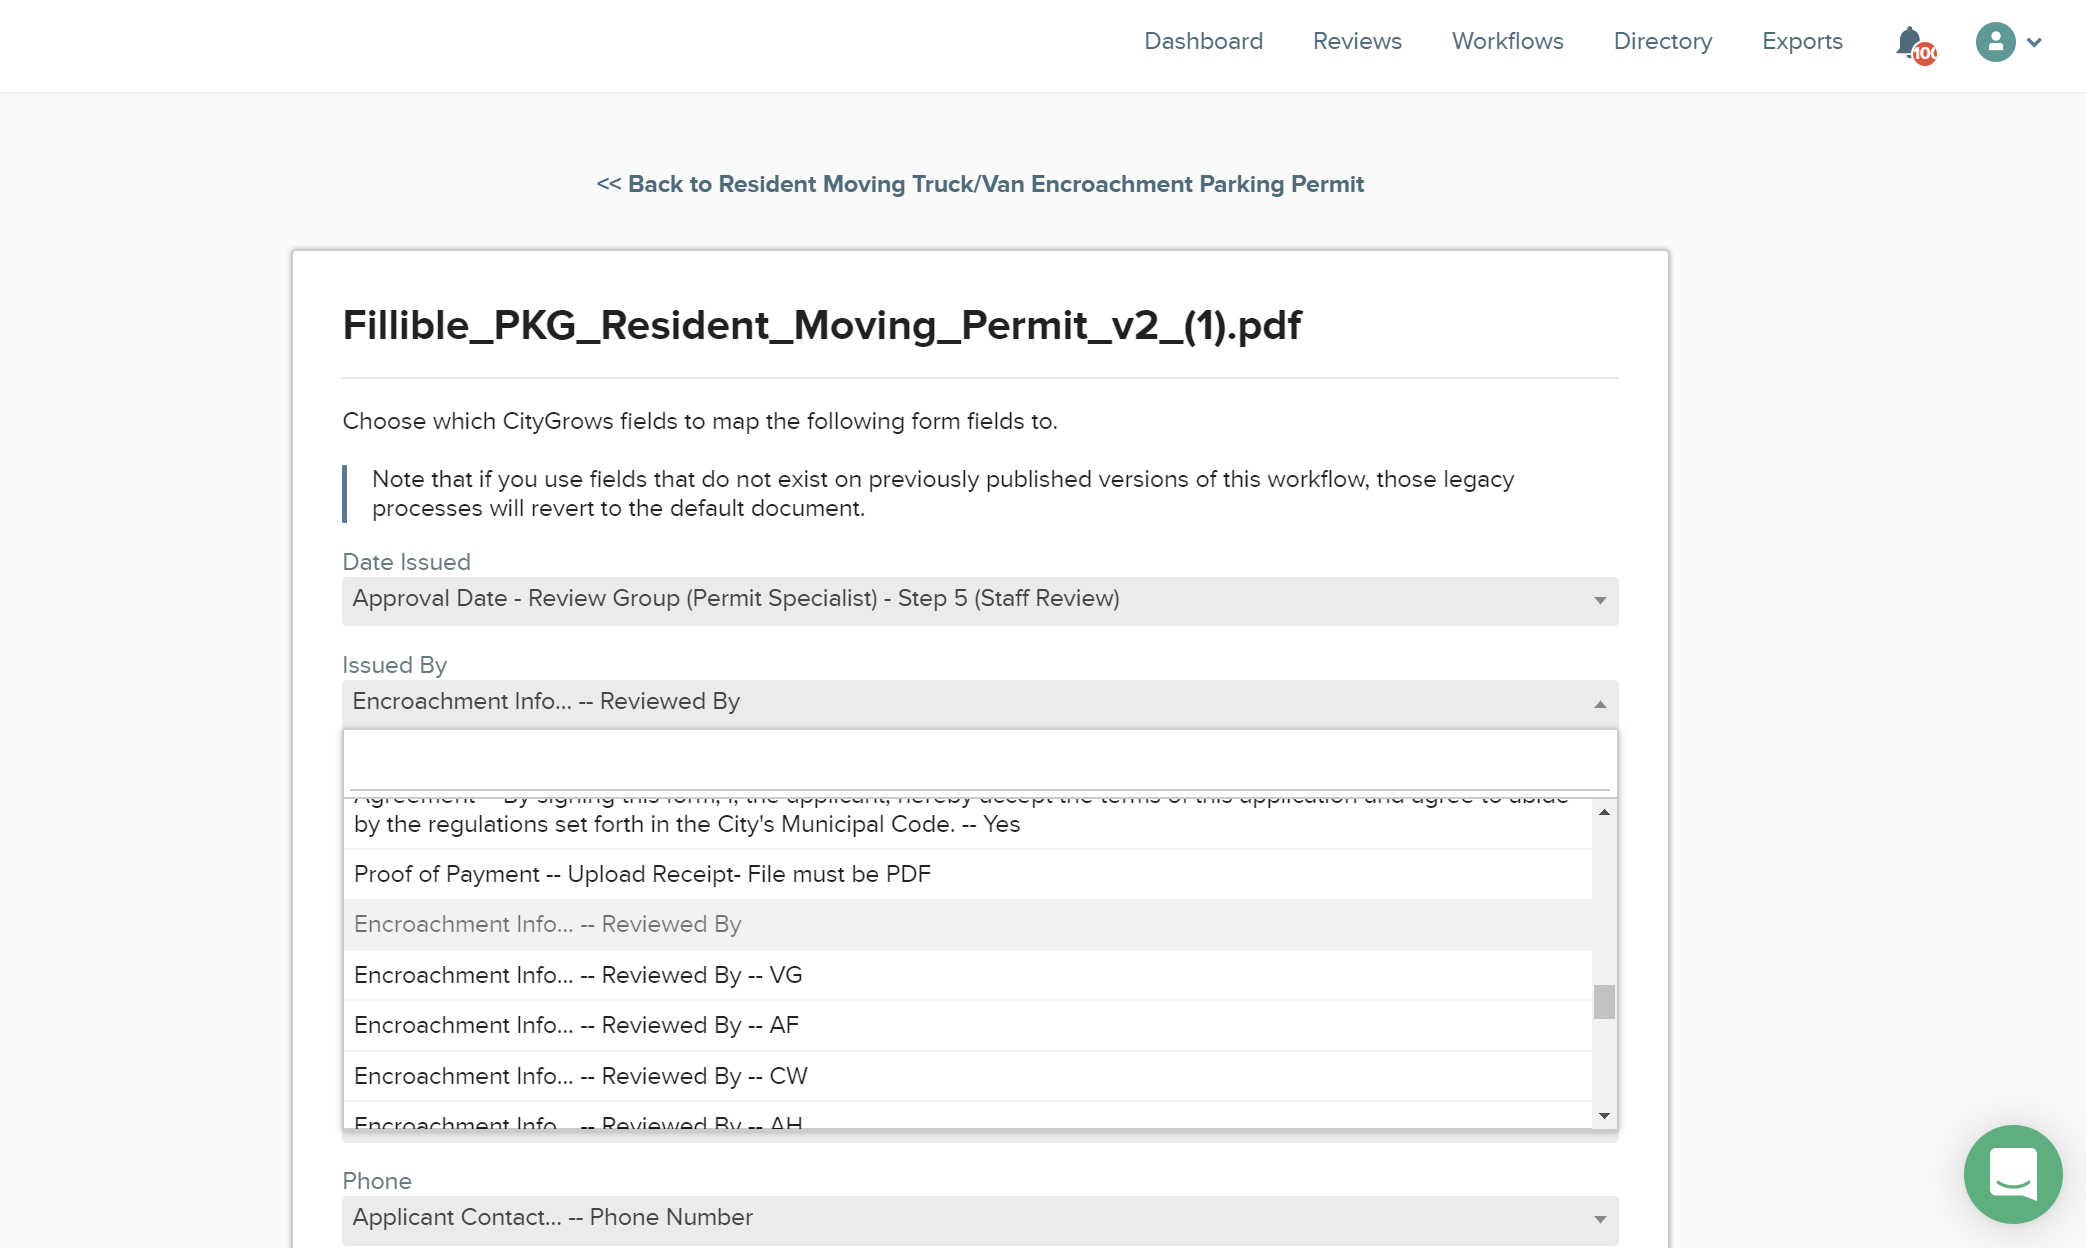 CityGrows fillable pdf page